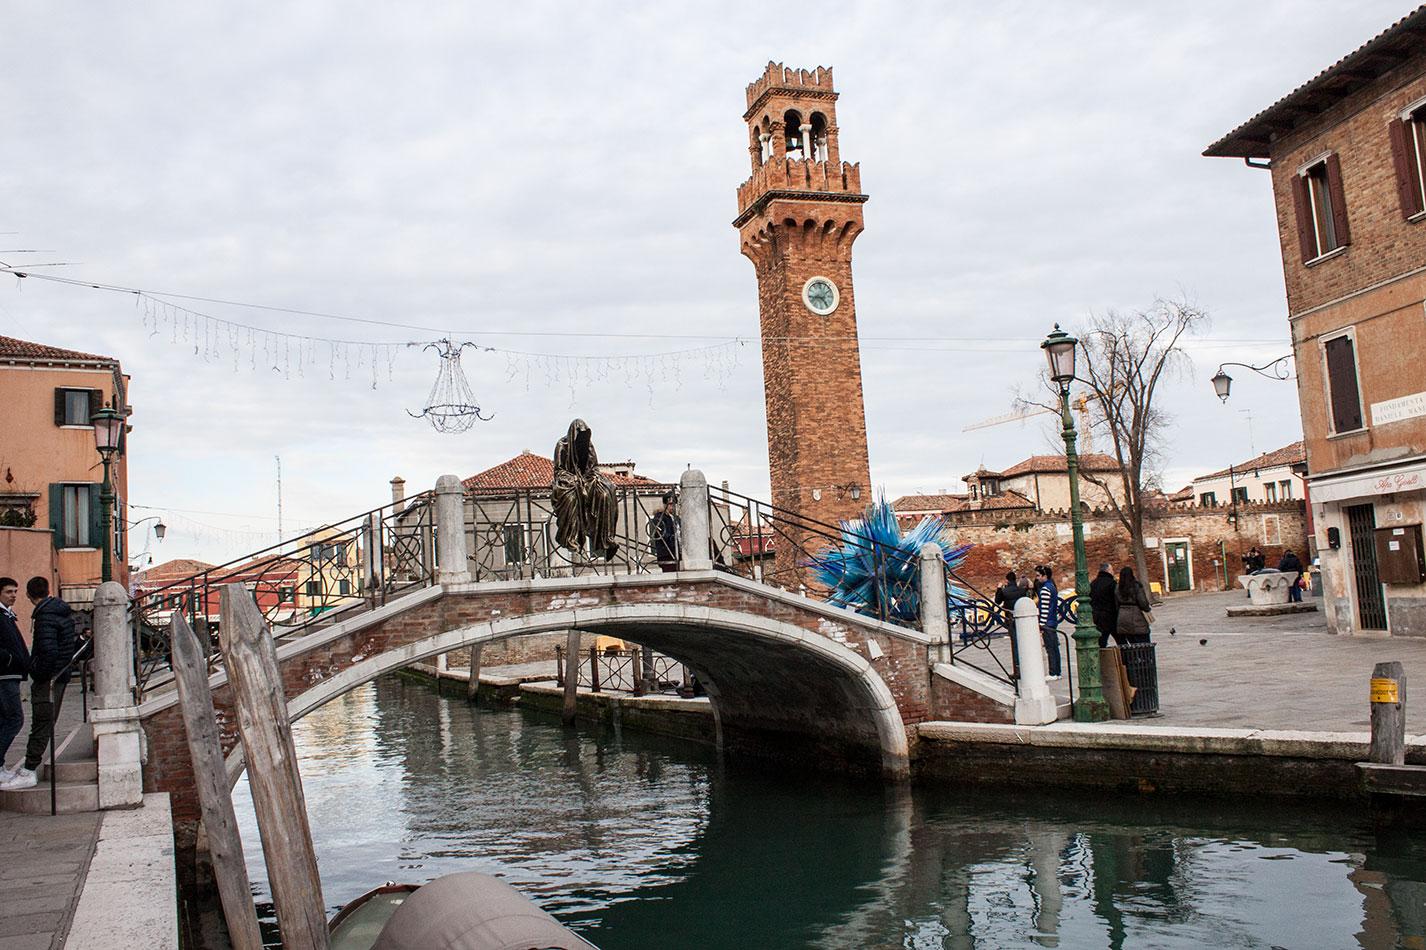 Italia-Venice-Murano-Berengo-glas-studio-glasstress-guardians-of-time-by-Manfred-Kili-Kielnhofer-contemporary-art-design-show-7204